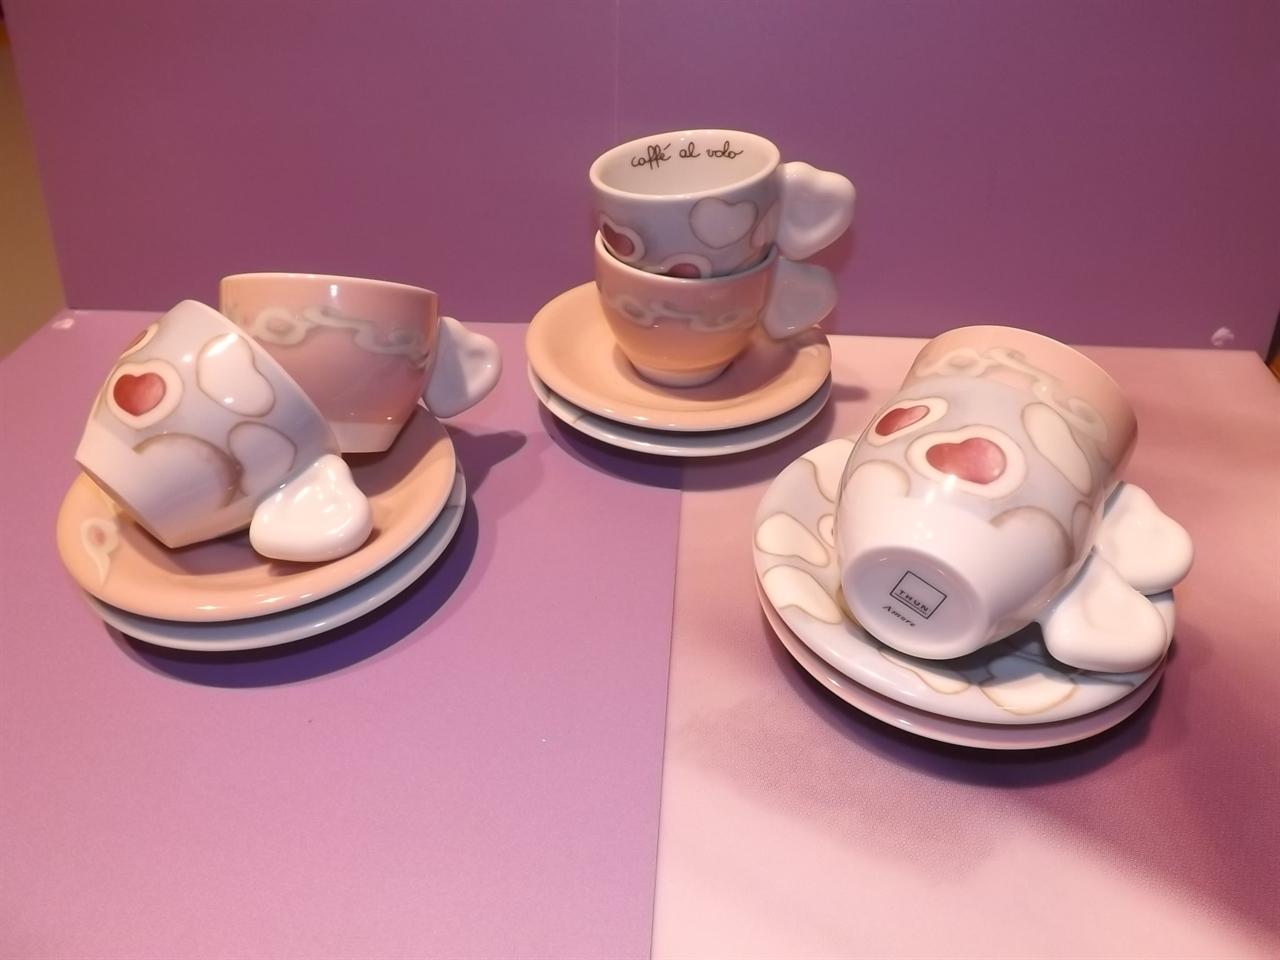 CATALOGO : Thun CAFFE\' AL VOLO